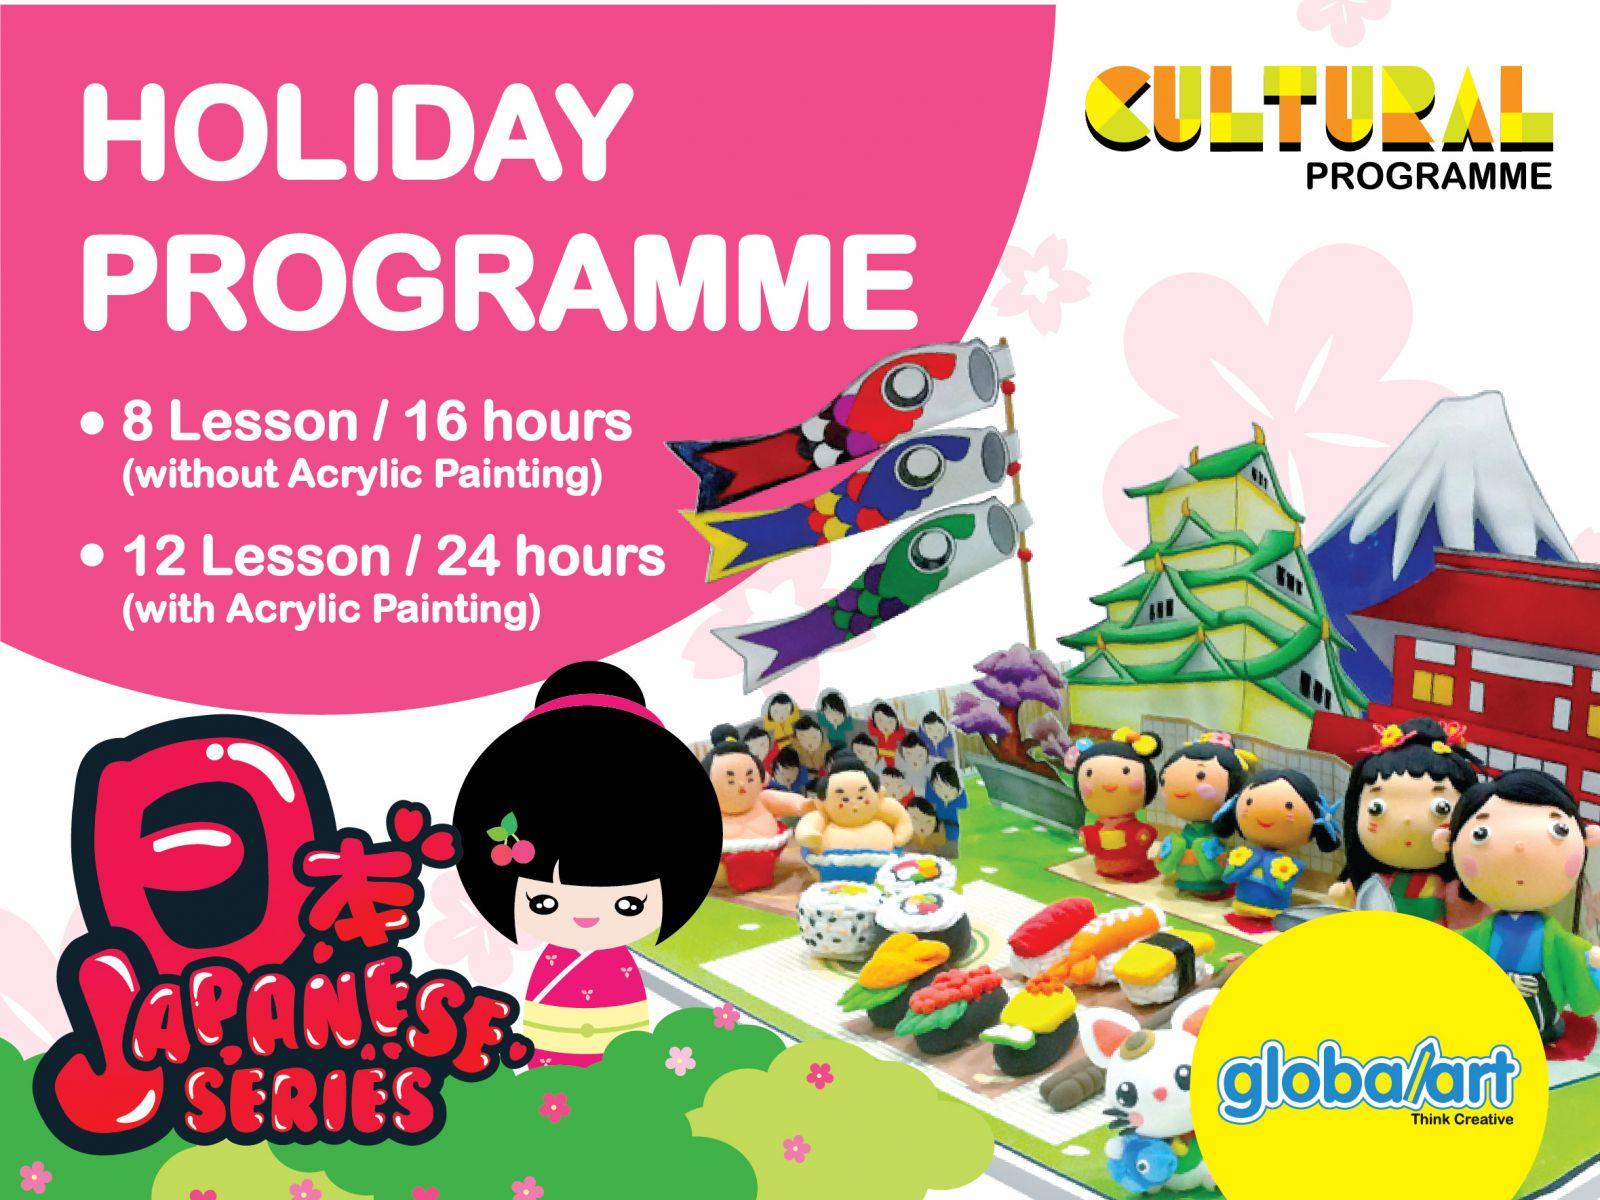 Global Art Holiday Program 2015